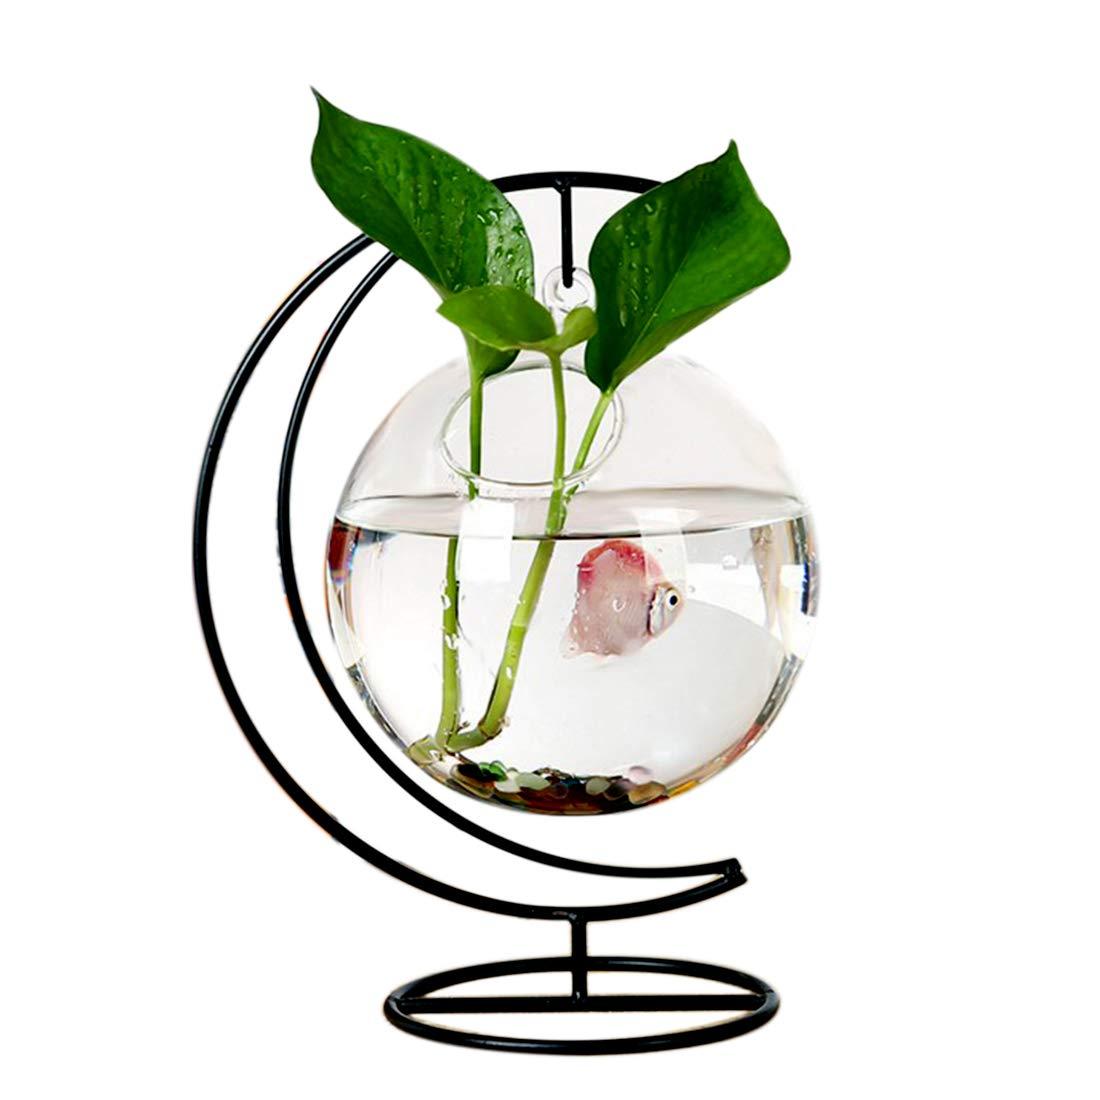 RuiyiF Desk Hanging Fish Tank Bowl with Stand Creative, Small Table Glass Fish Vase Aquarium for Home Decor (1 Fish Bowl) by RuiyiF